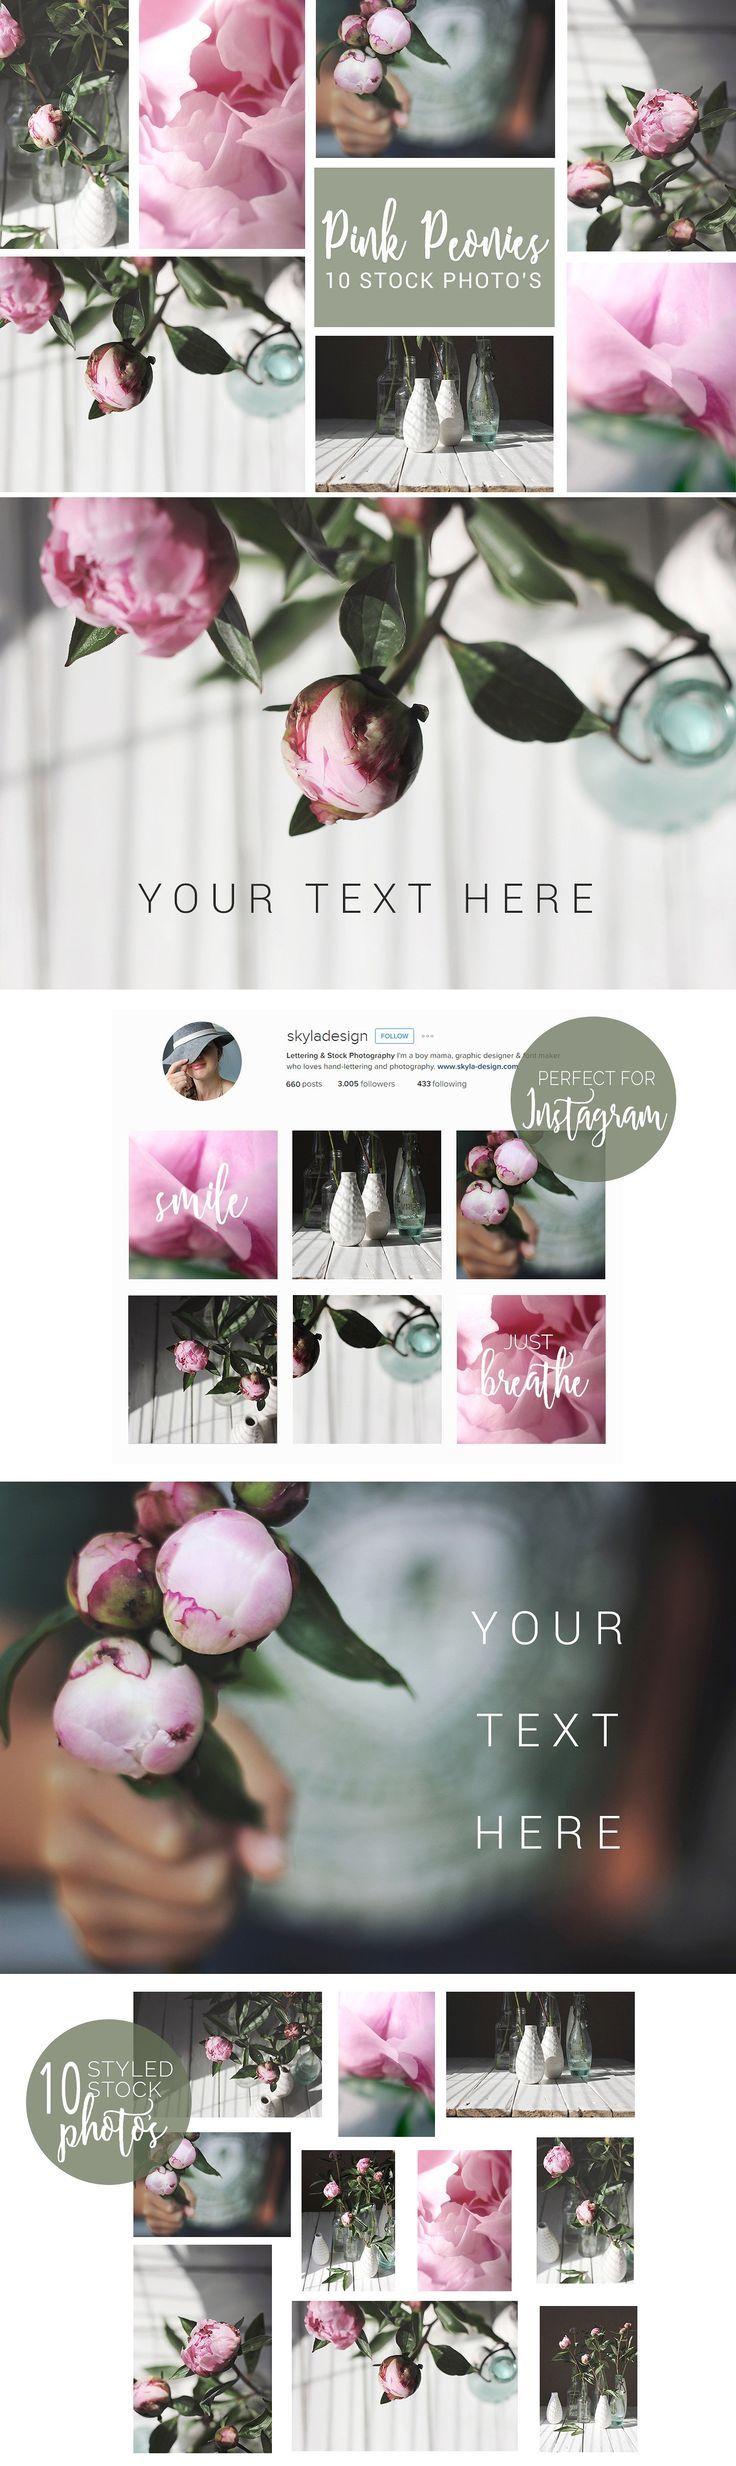 Pink peonies, styled stock photos - Product Mockups #photo #photography #stock #social #styled #image #stockimage #stockphoto #mockup #blog #blogging #flower #pink